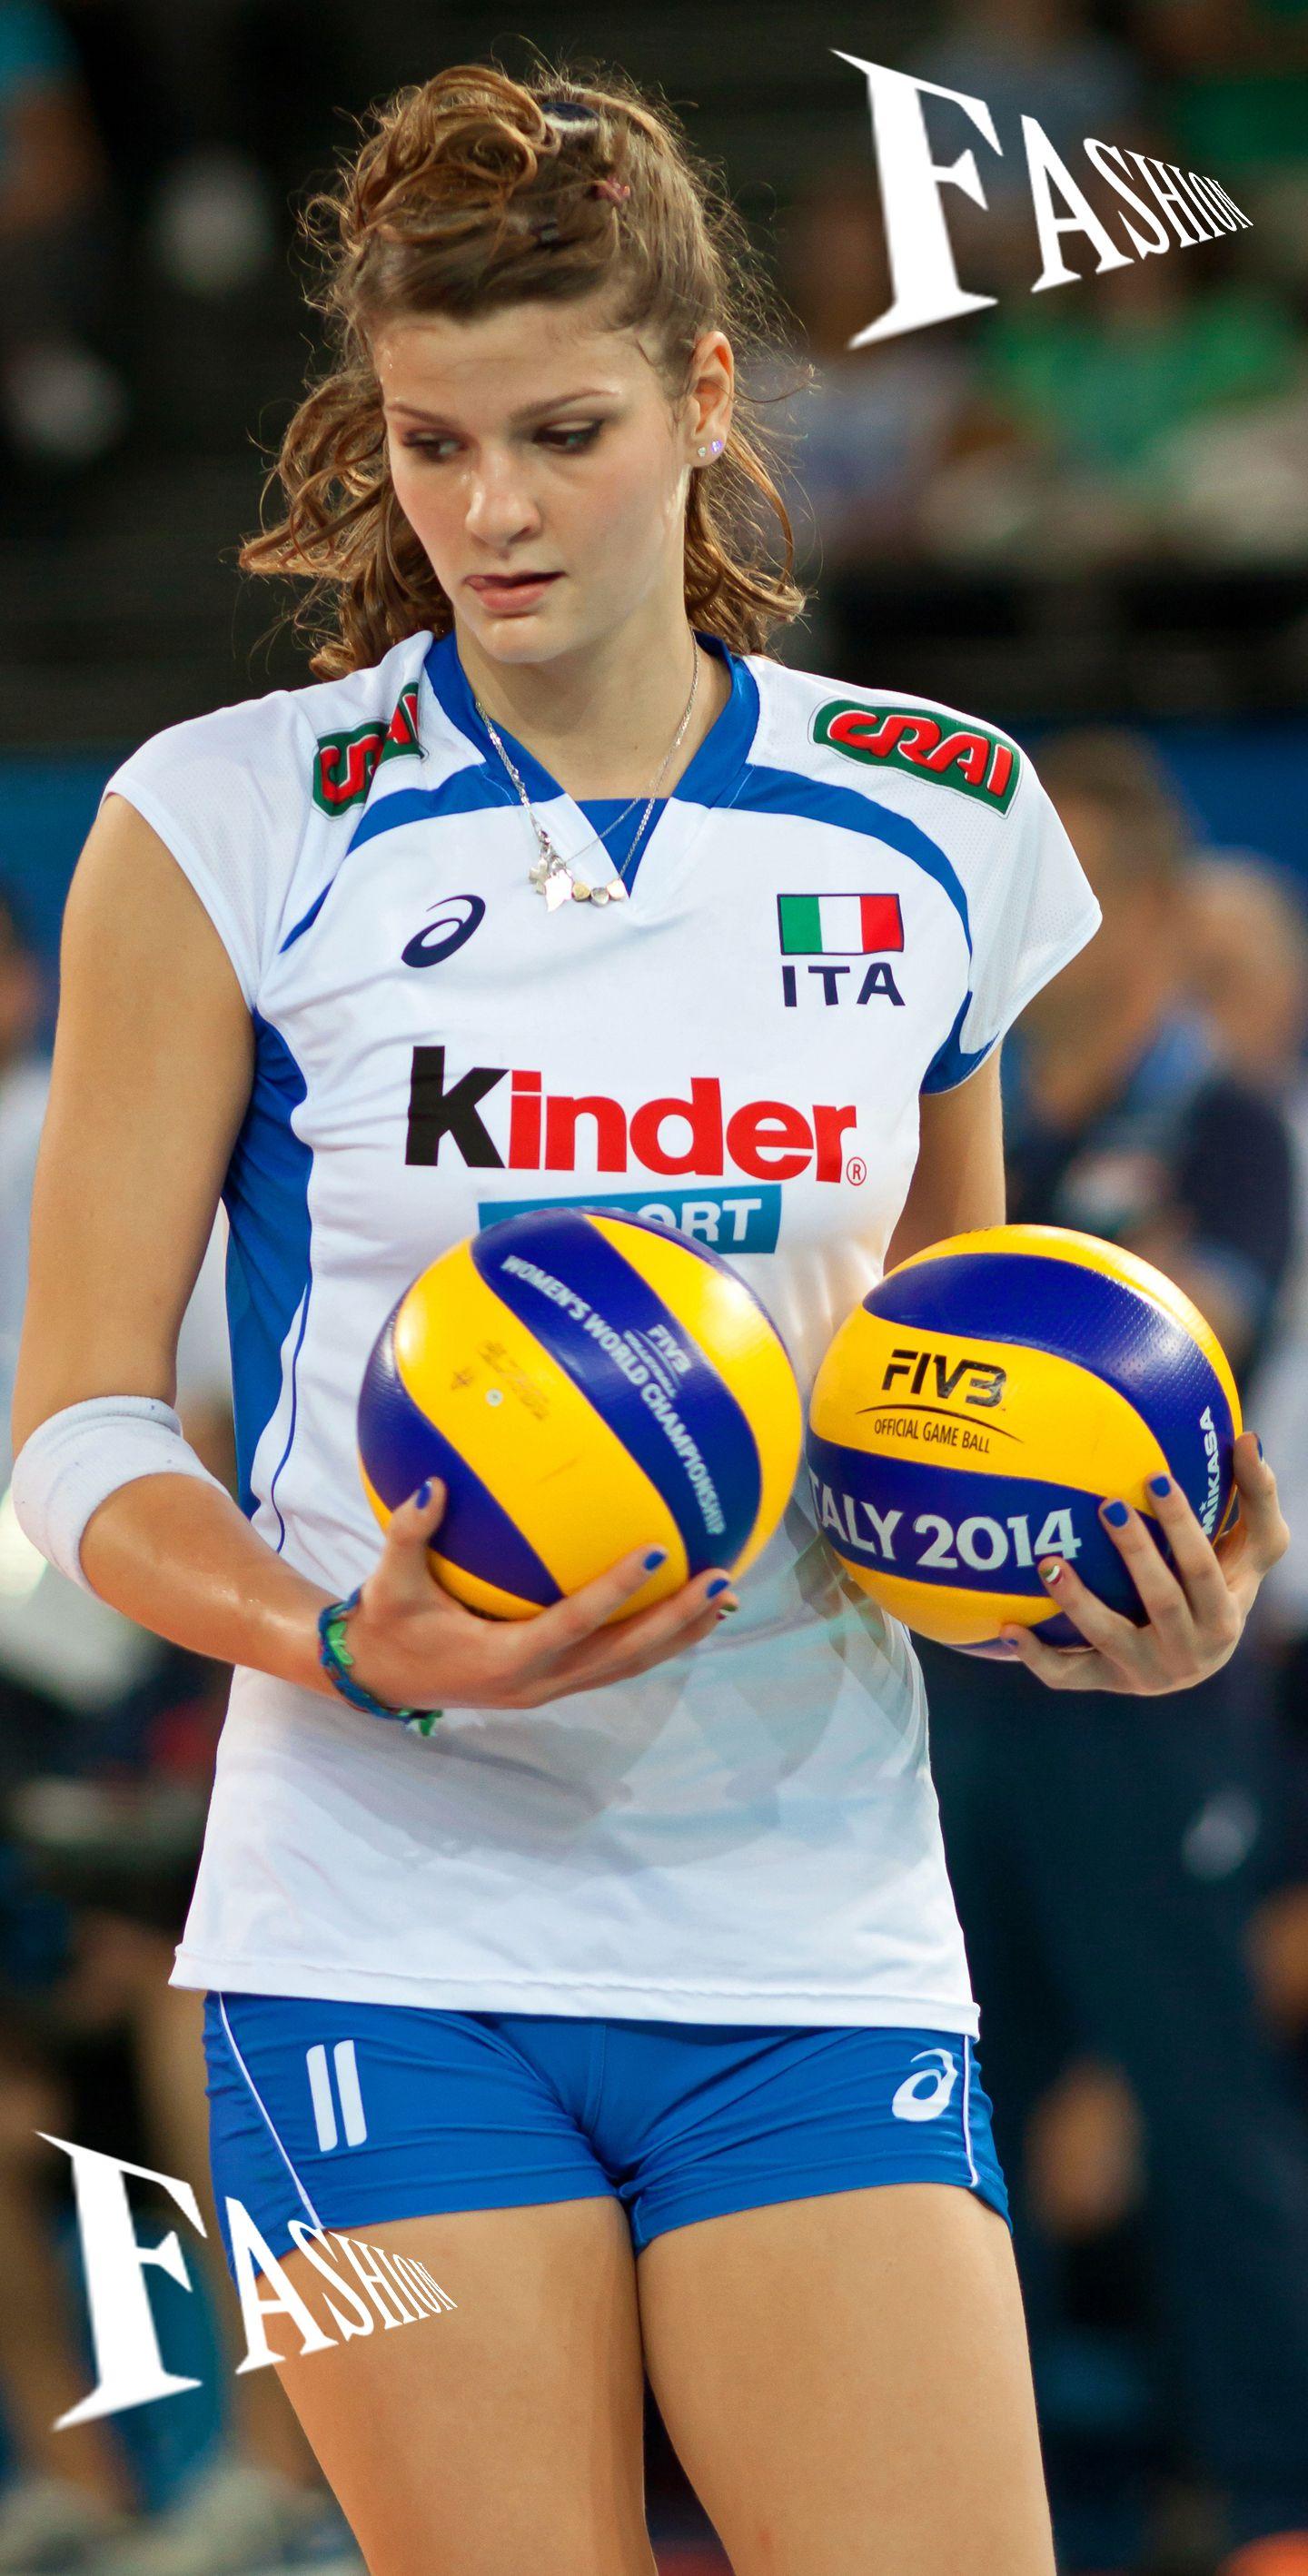 Fivb Women S Volleyball World Championship 2014